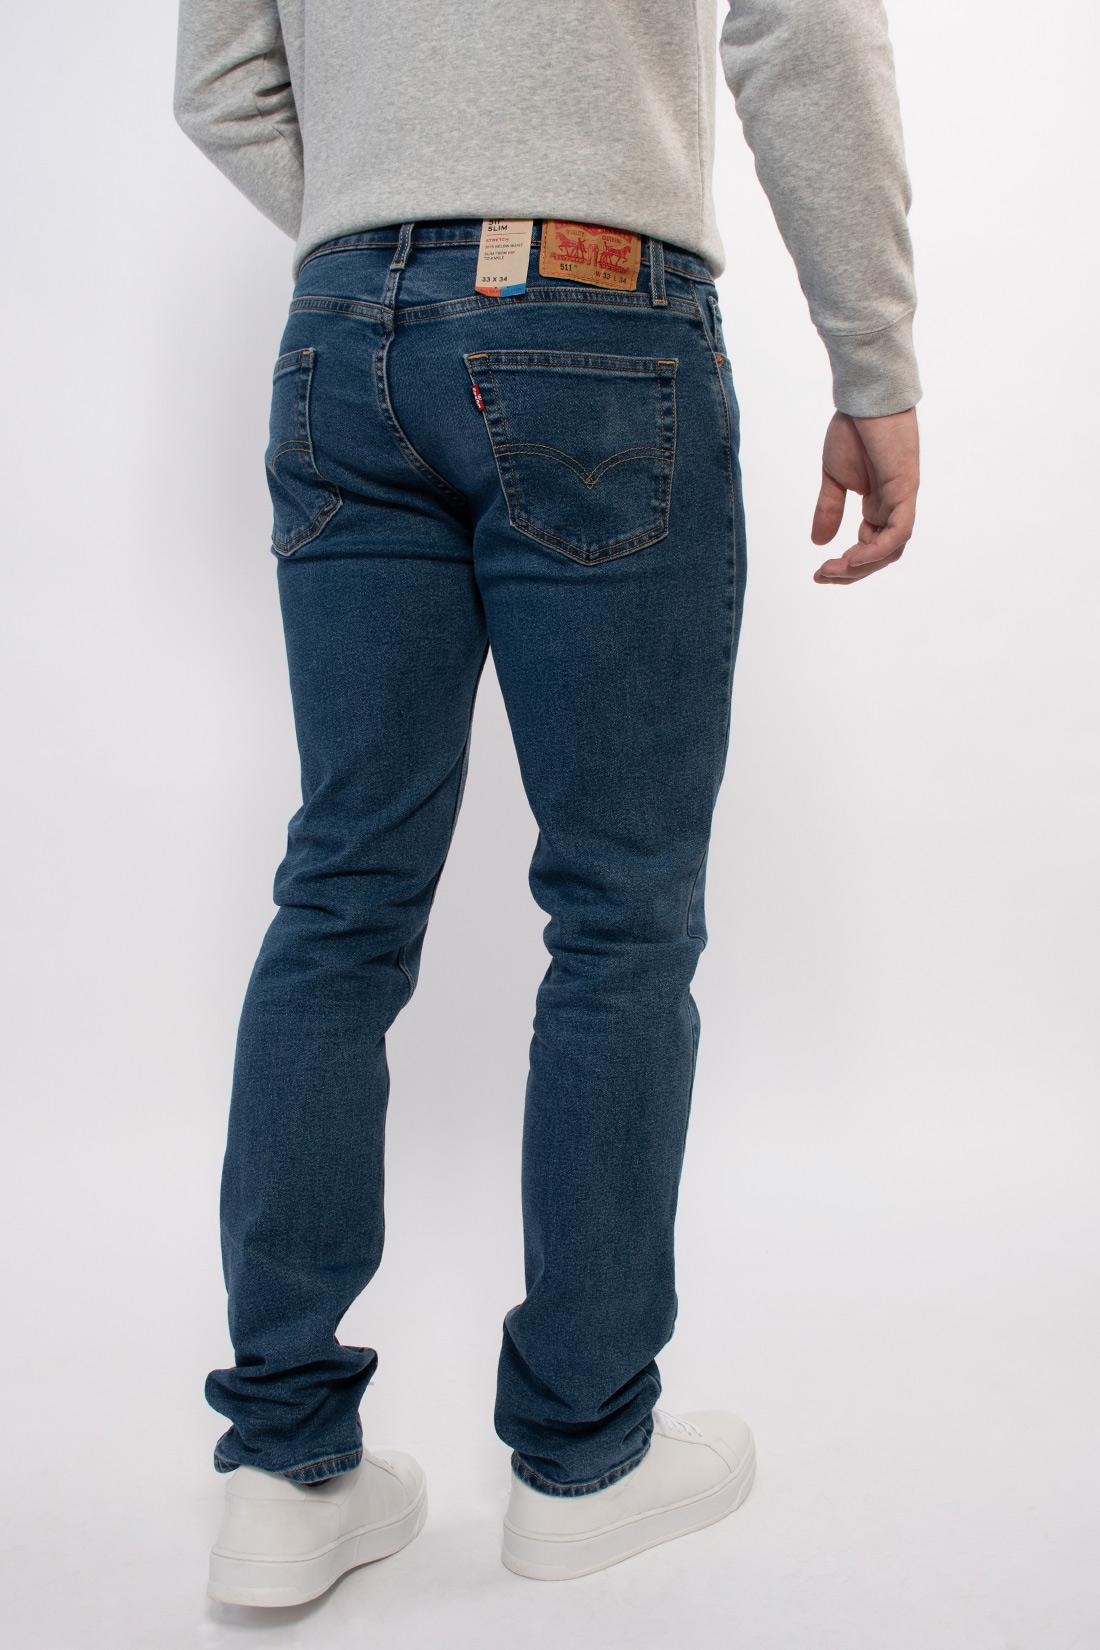 Calca Jeans Levis 511 Slim Stretch